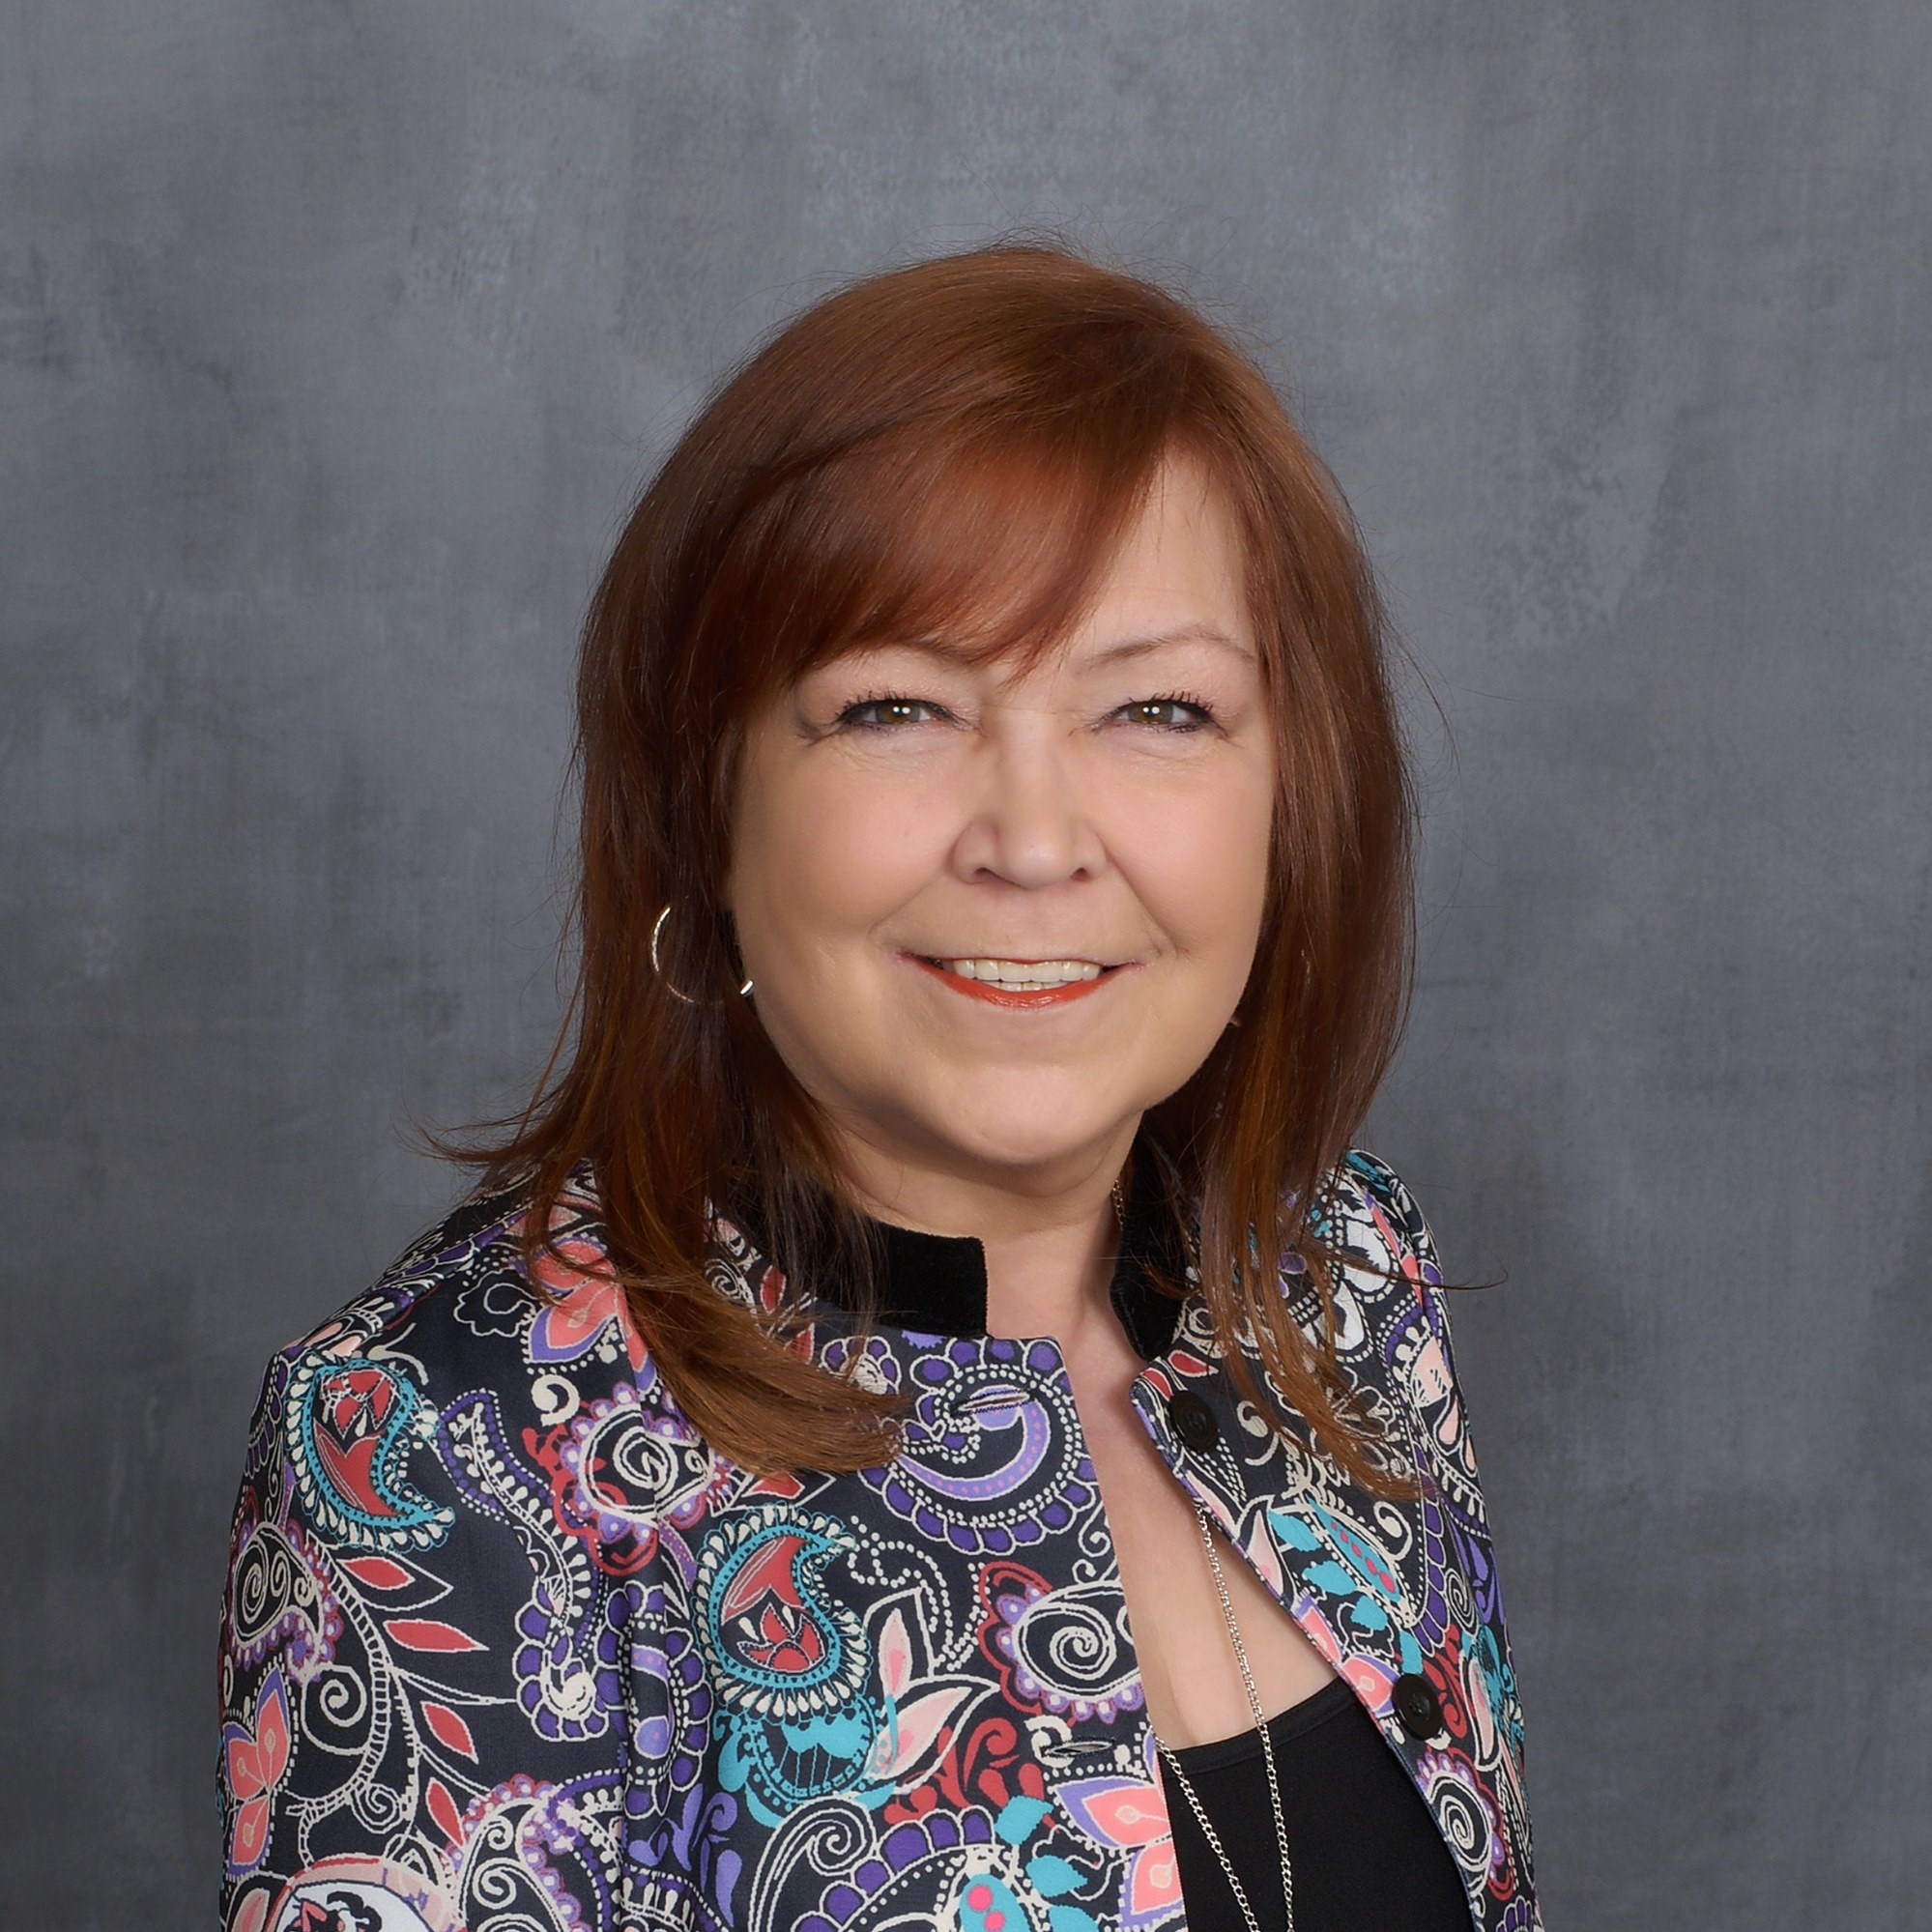 Kate Becker, Creative Economy Strategist | King County